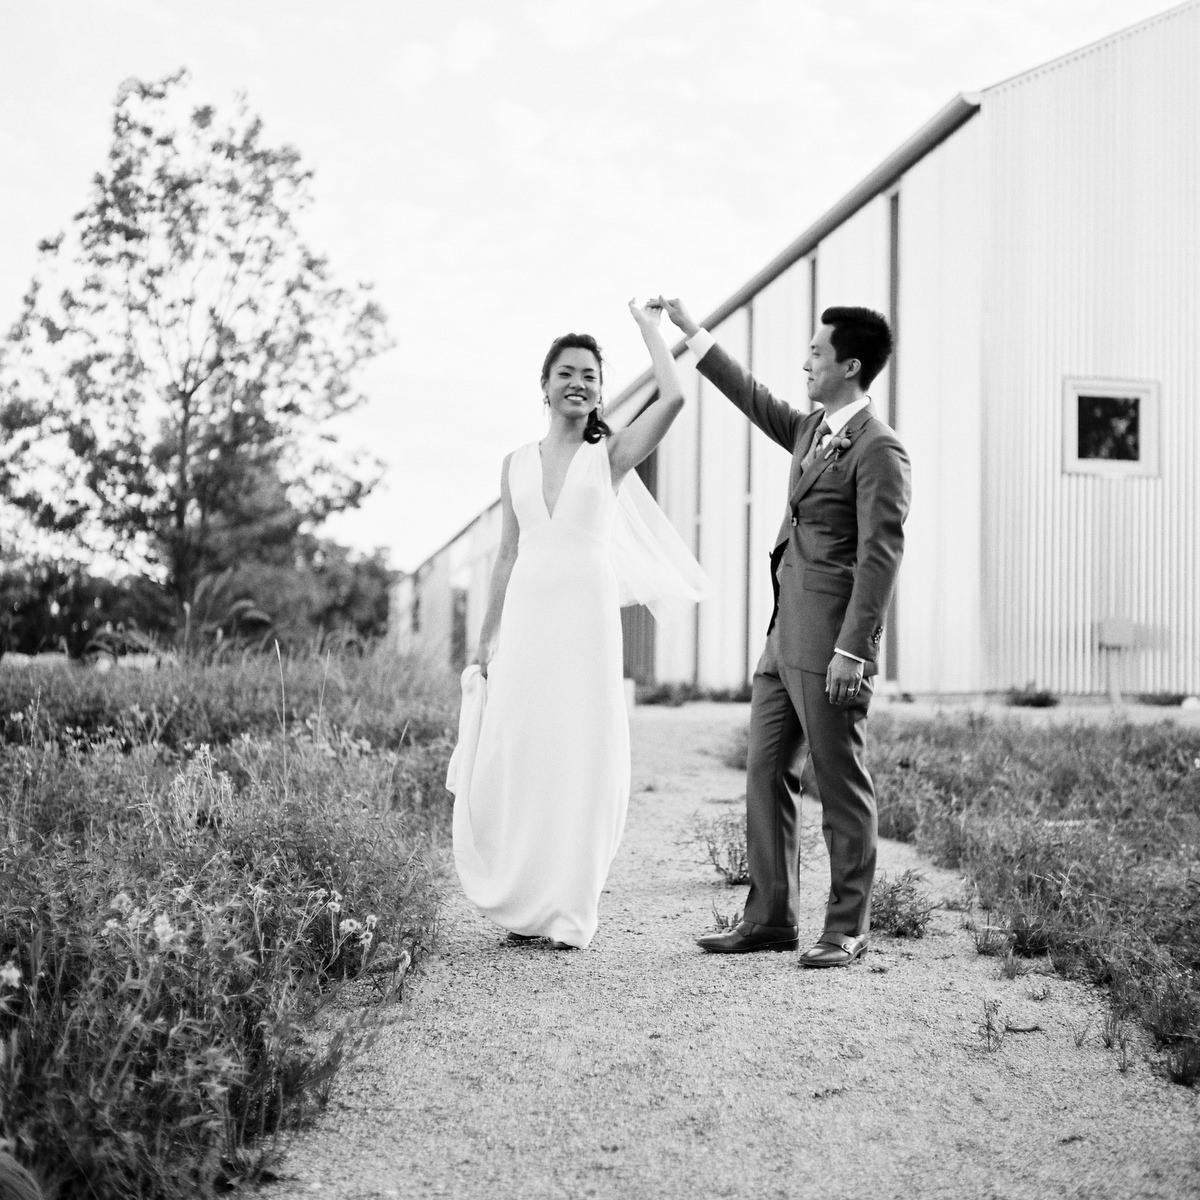 film photographer austin texas